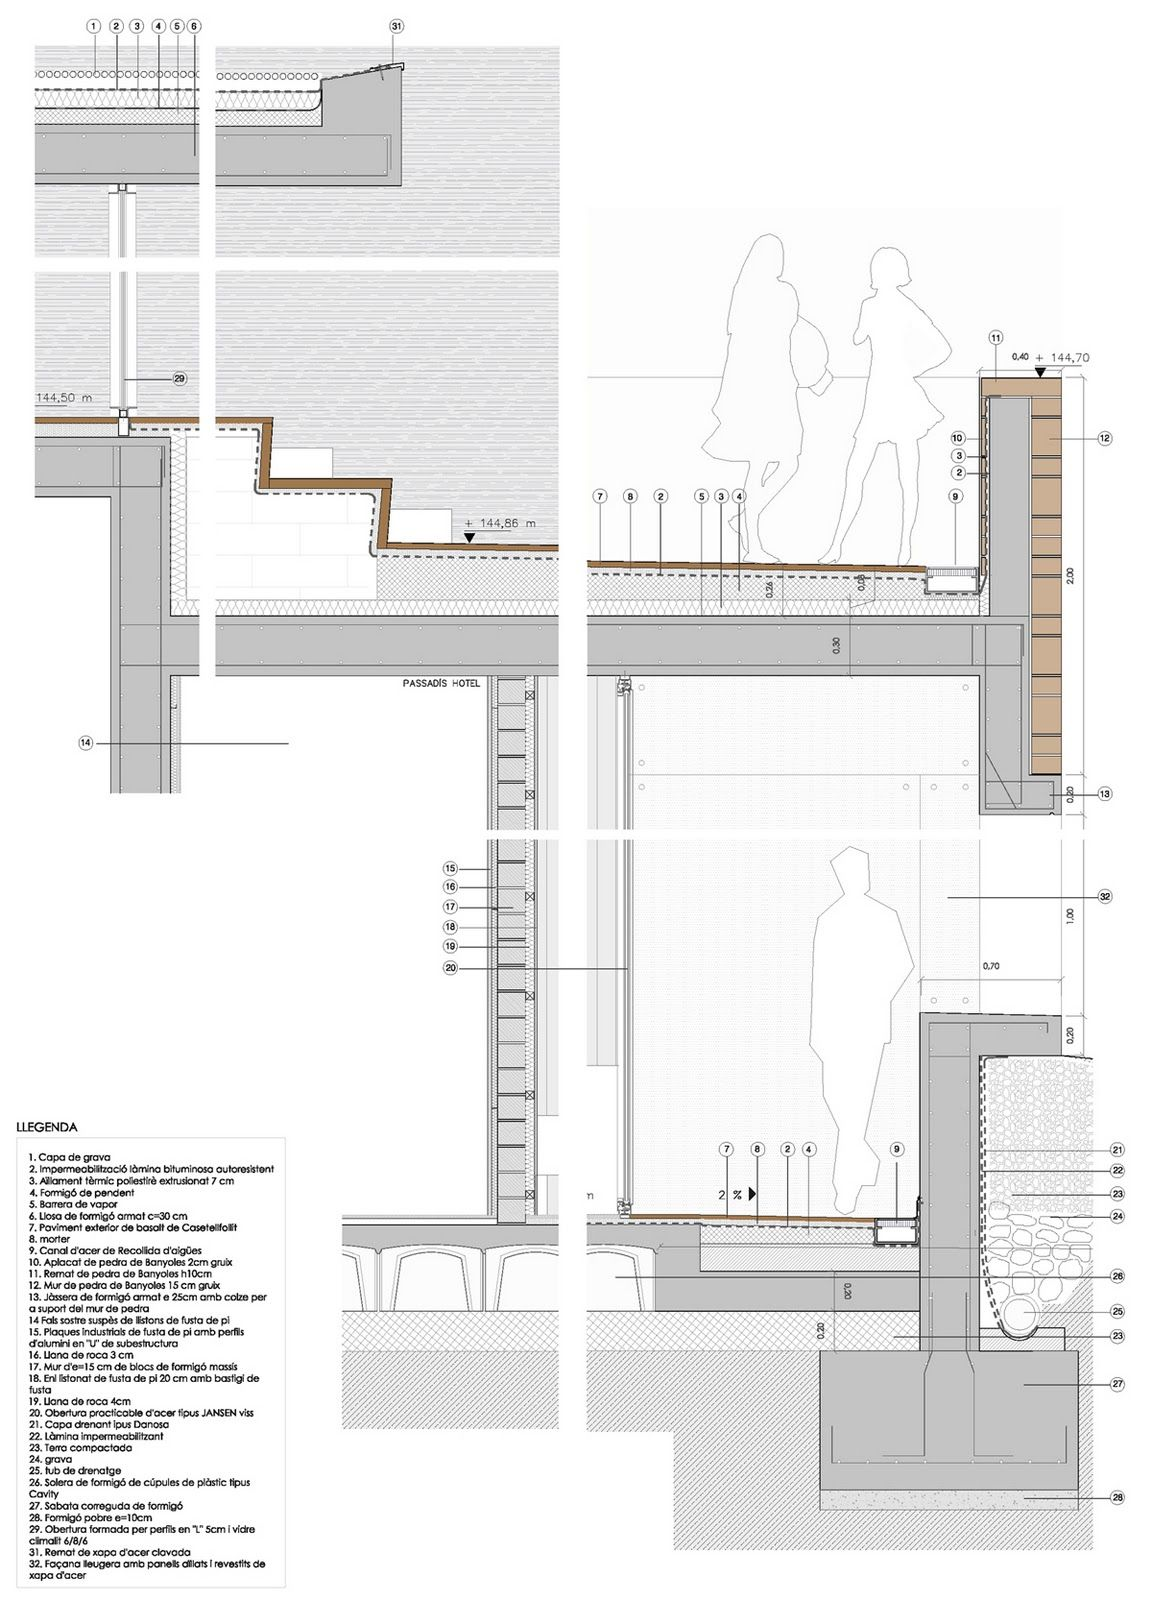 1000 ideas about architecture details on pinterest cad for Meuble architectural